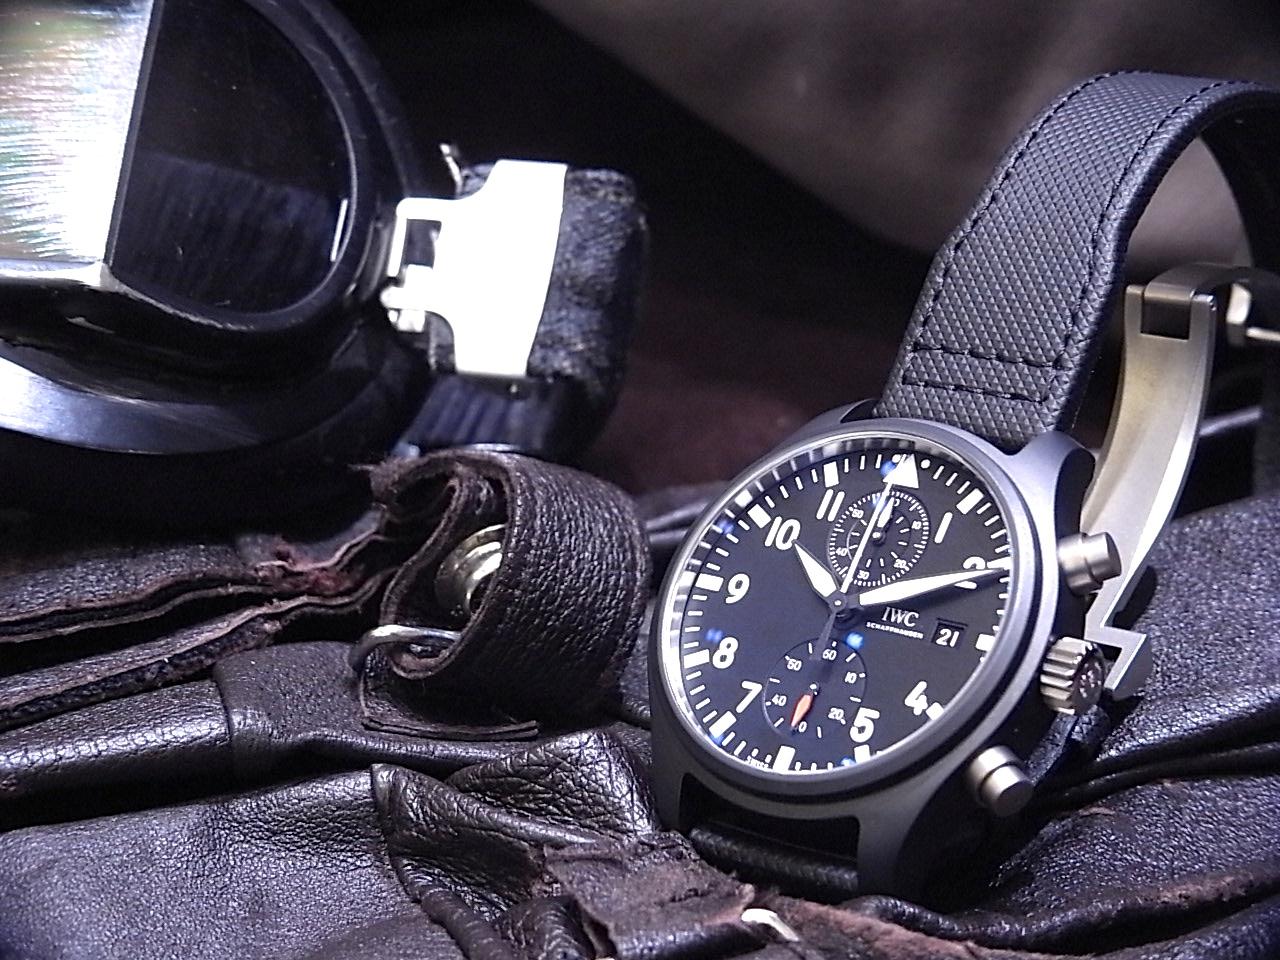 "IWCパイロットウォッチ、ブラックのコックピットデザインに、魅力的な素材の組み合わせと最新の時計技術を兼ね備える ""トップガン"" シリーズ。"